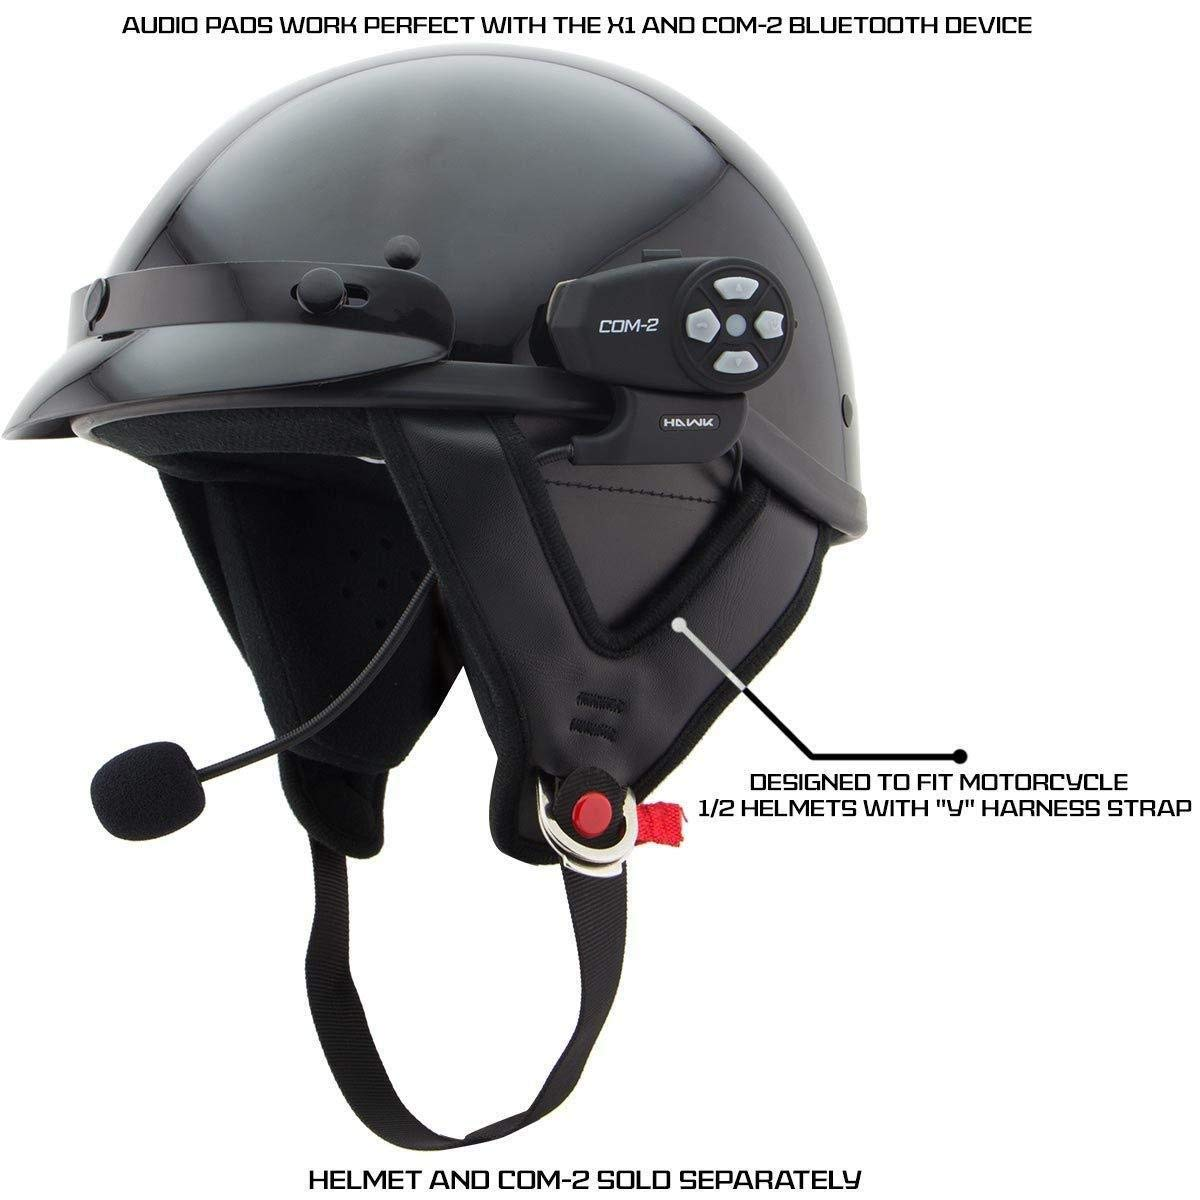 Outlaw Audio Speaker oreja Insertar Almohadillas comodidad con ...